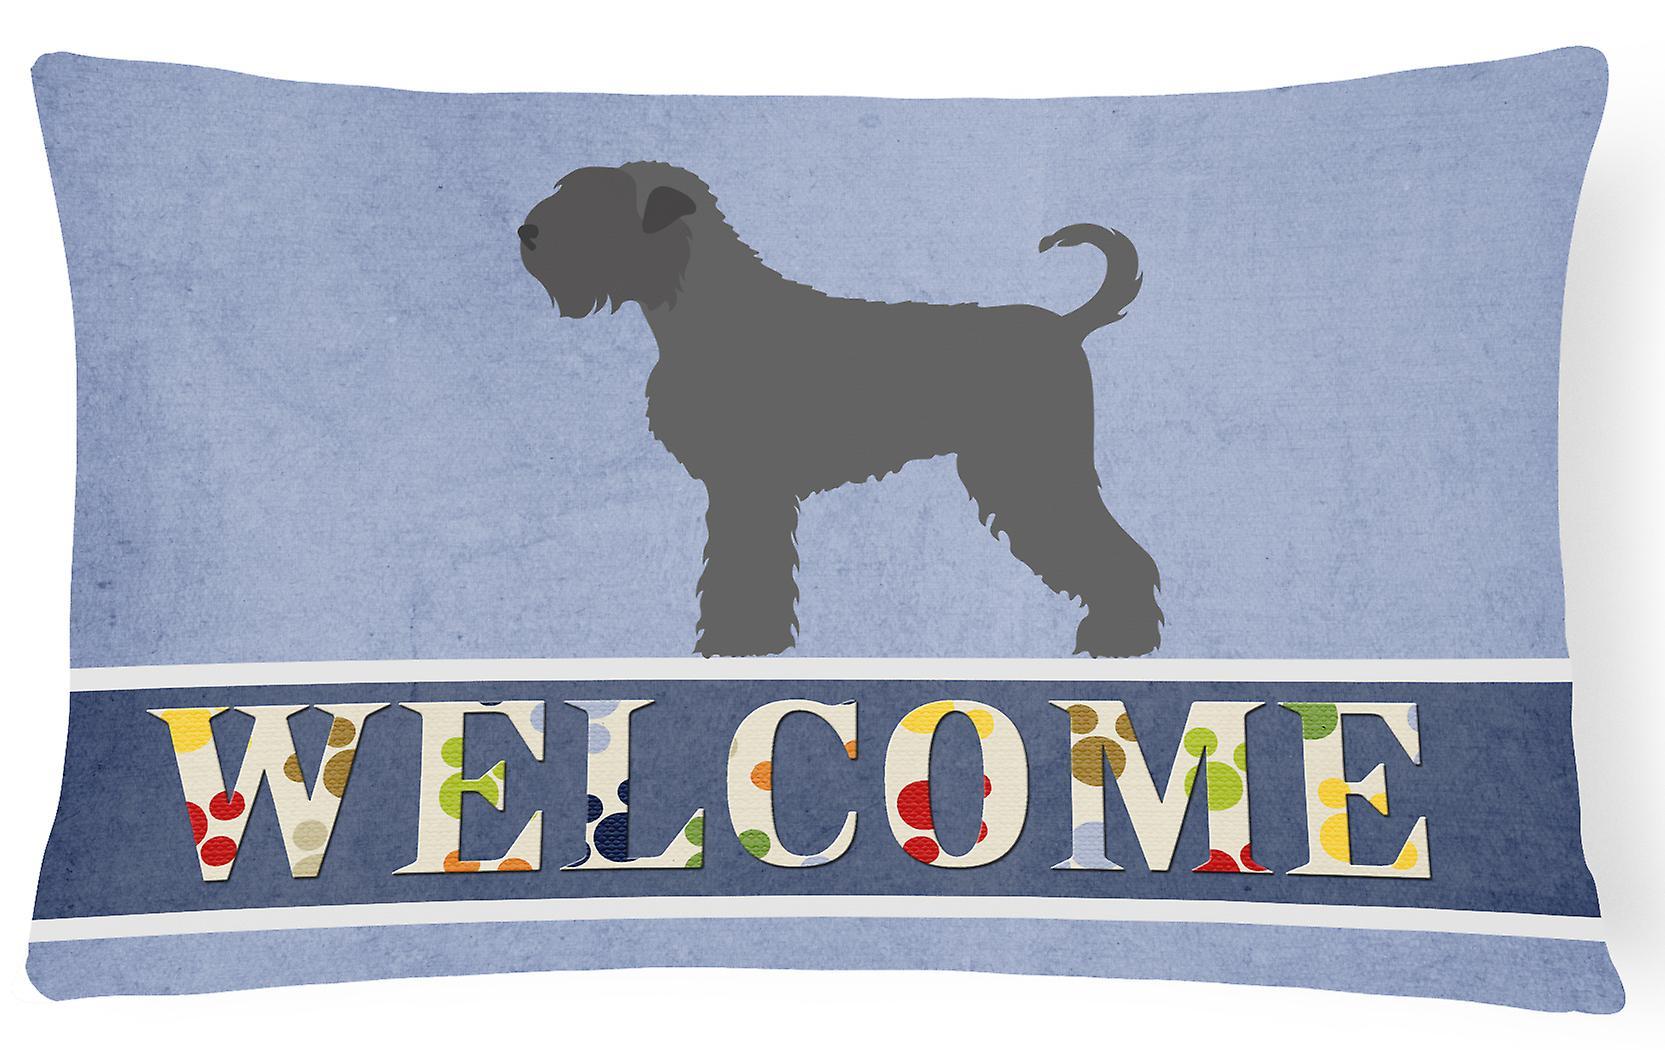 Black Russian Pillow Fabric Welcome Canvas Terrier Decorative PNwn0O8kXZ